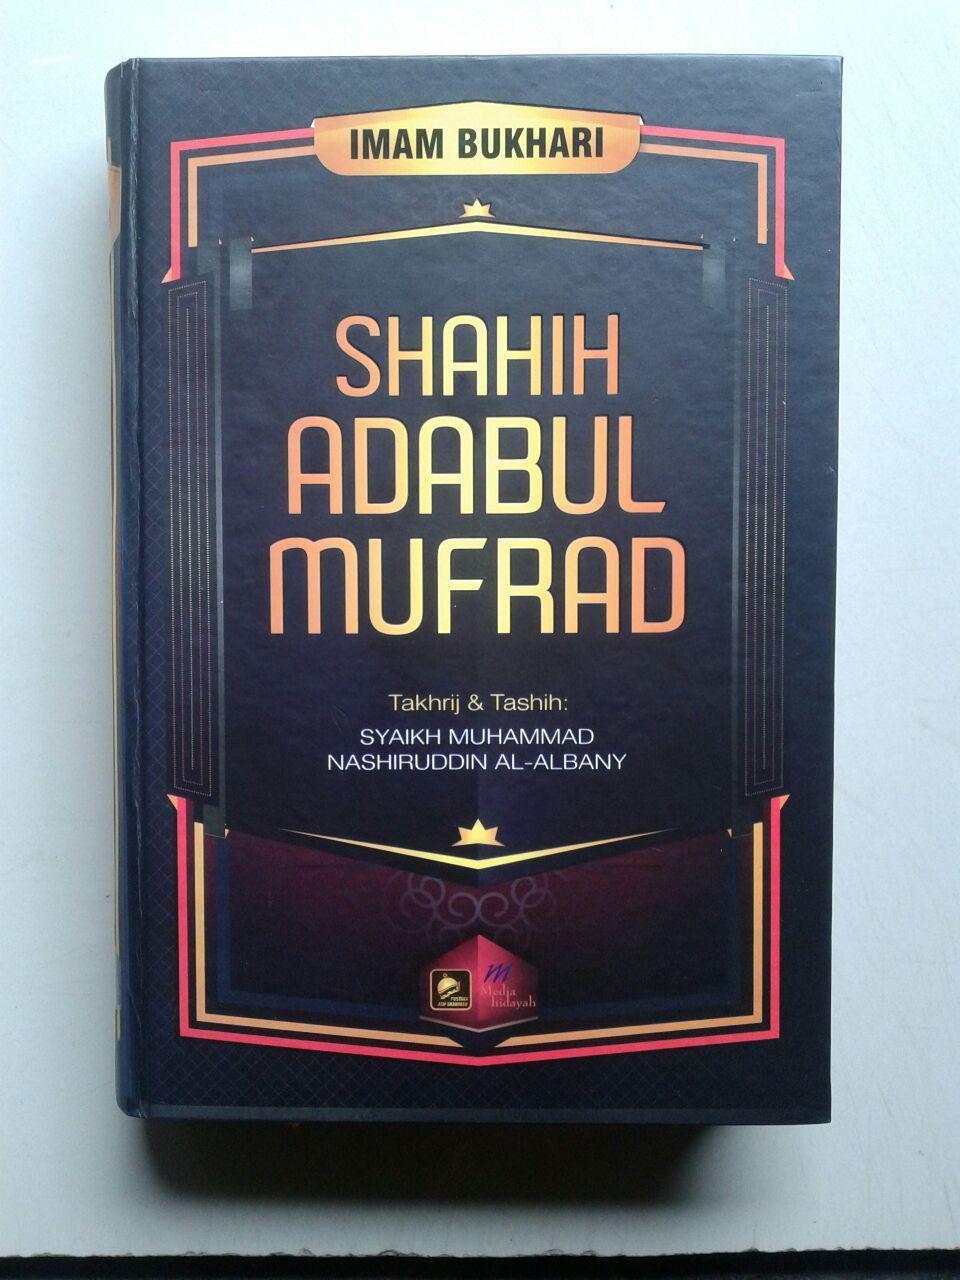 Buku Shahih Adabul Mufrad cover 2